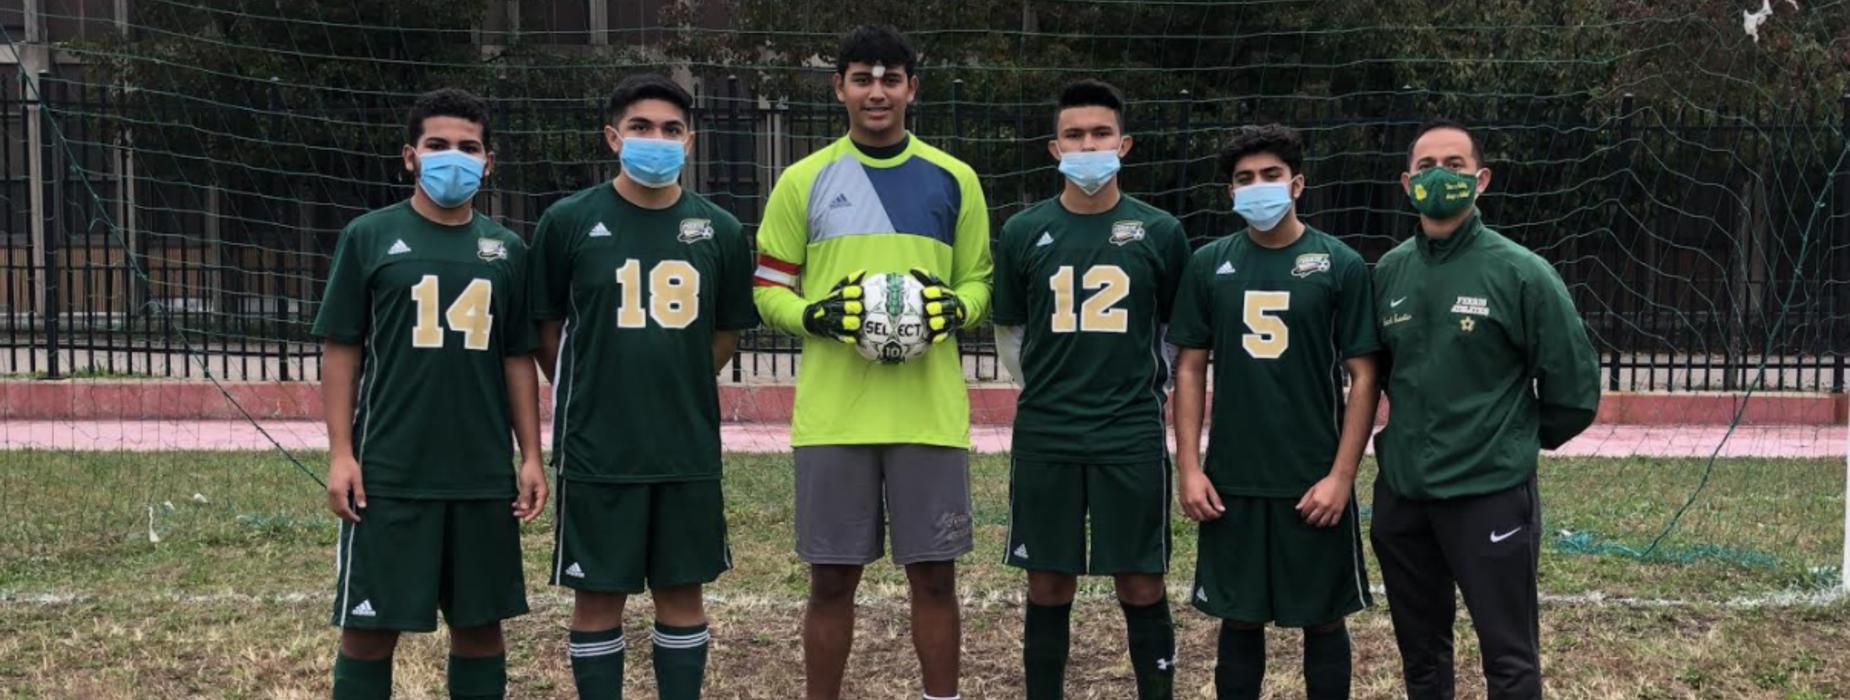 Class of 2021 Boys Soccer